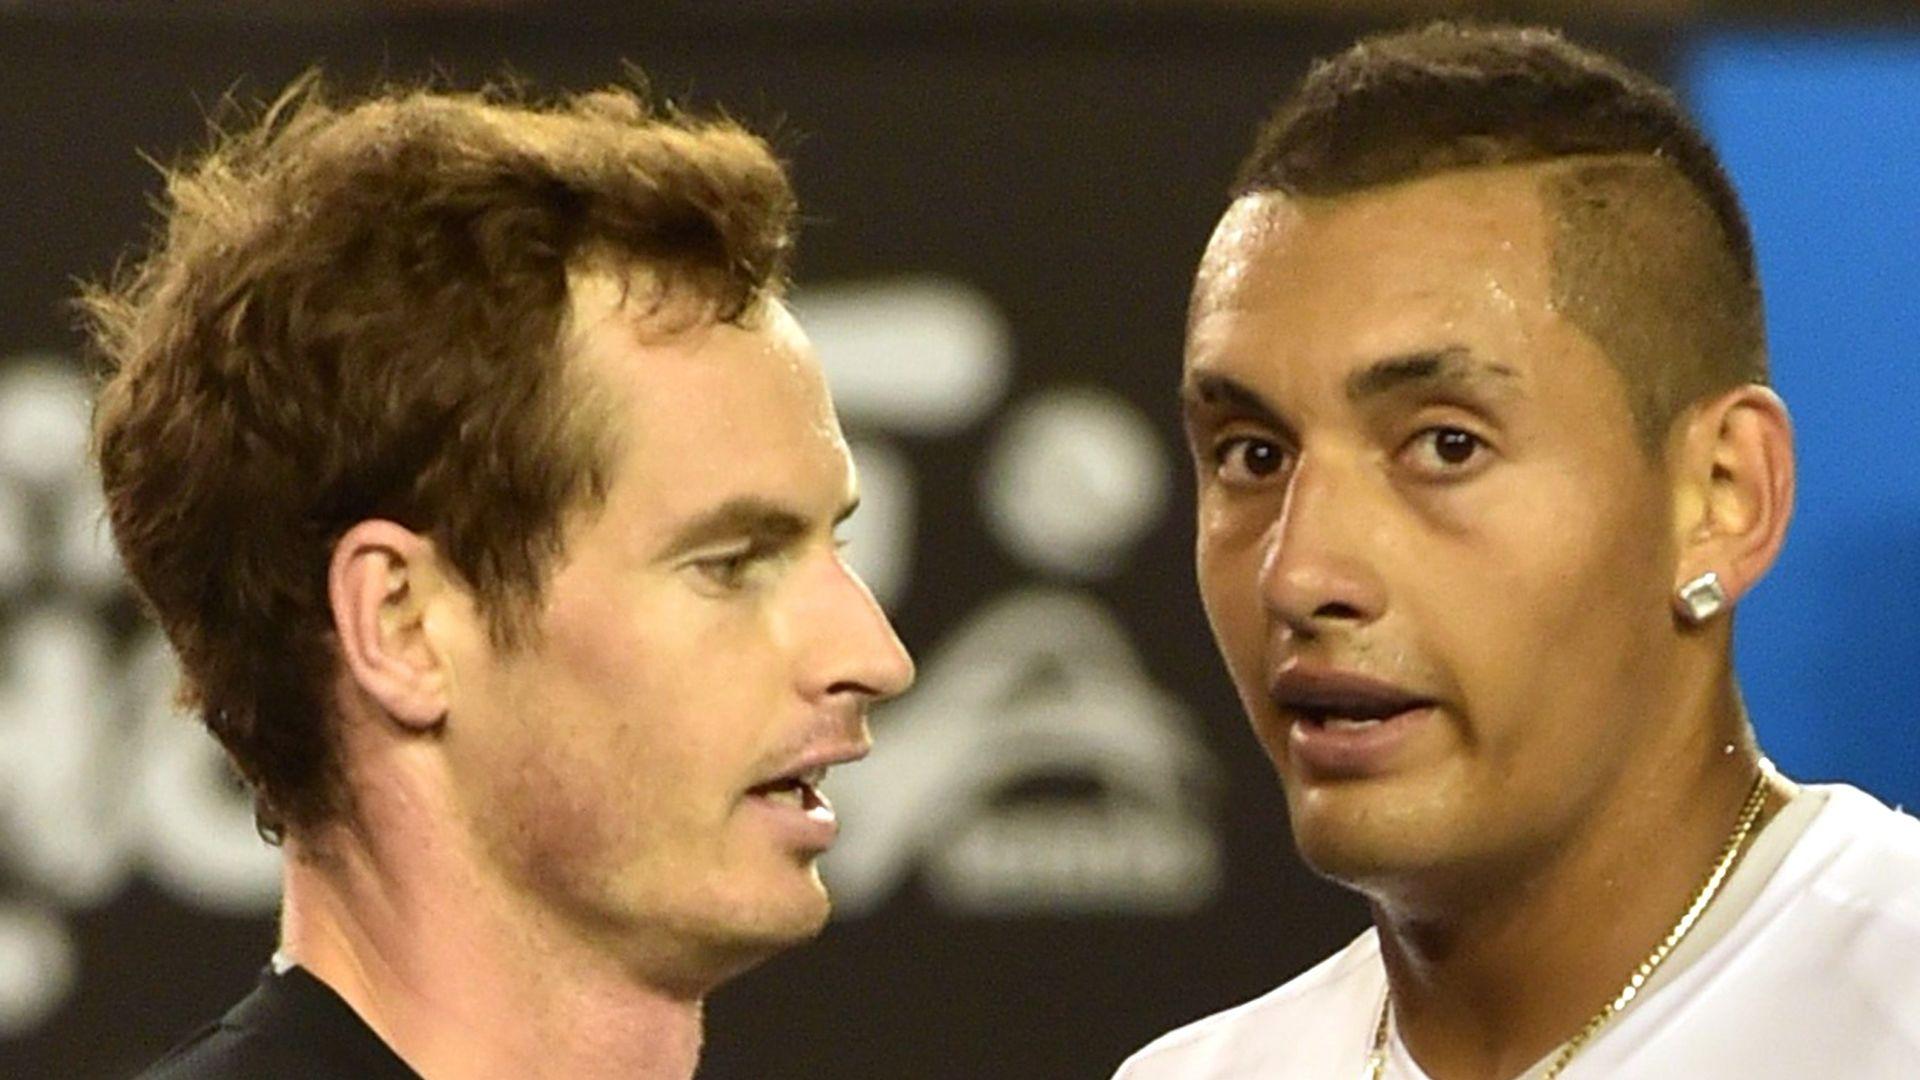 Tipsy Kyrgios tells Murray: You're better than Djokovic